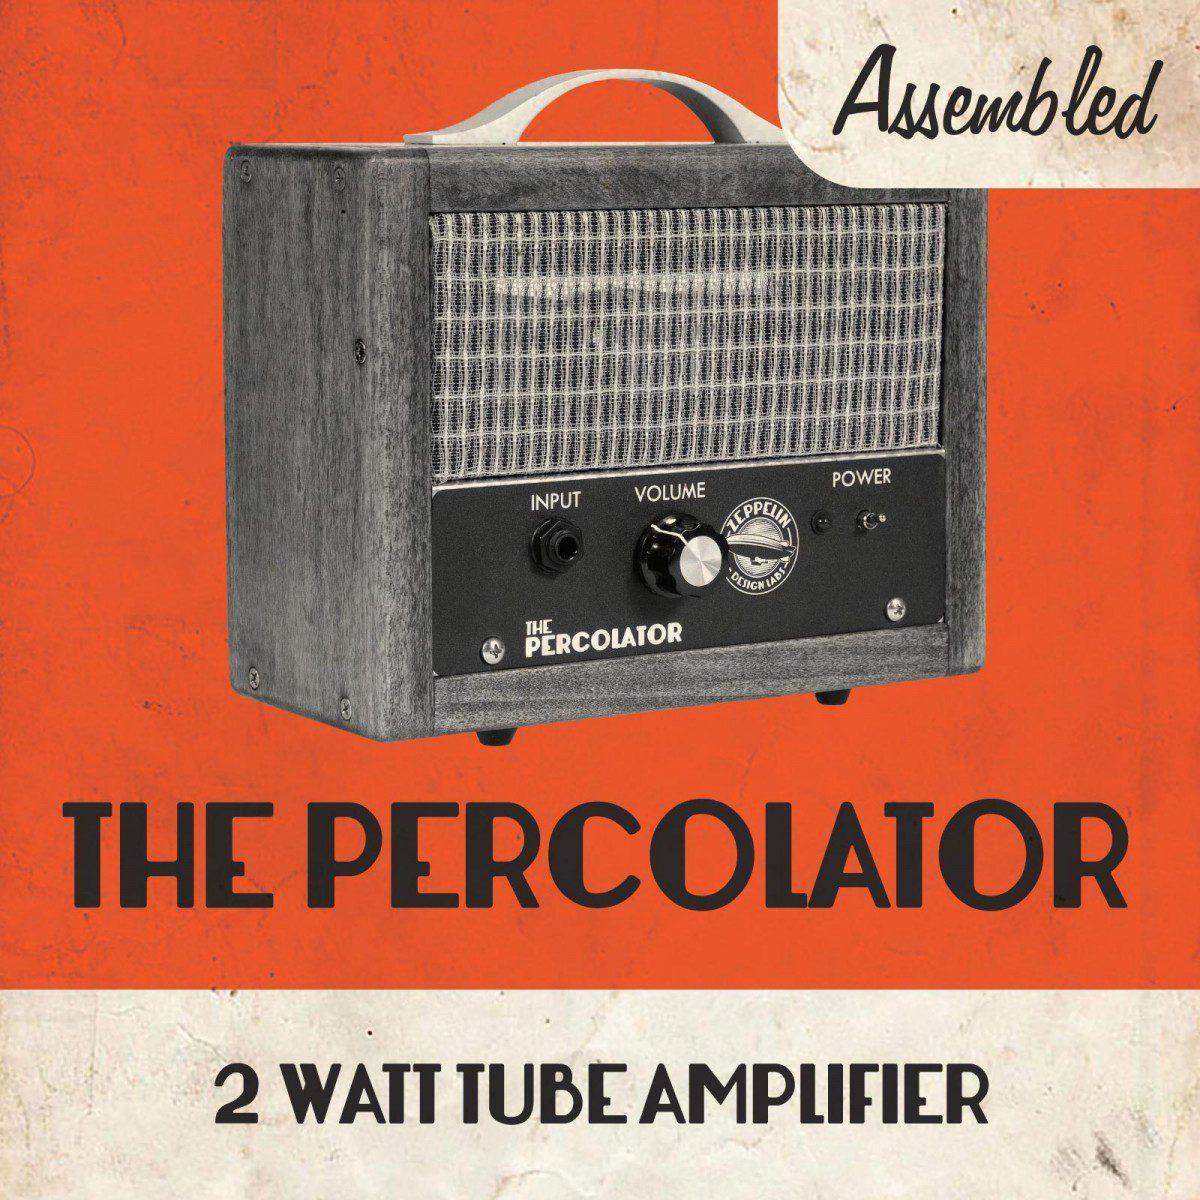 The Percolator Amp Assembled